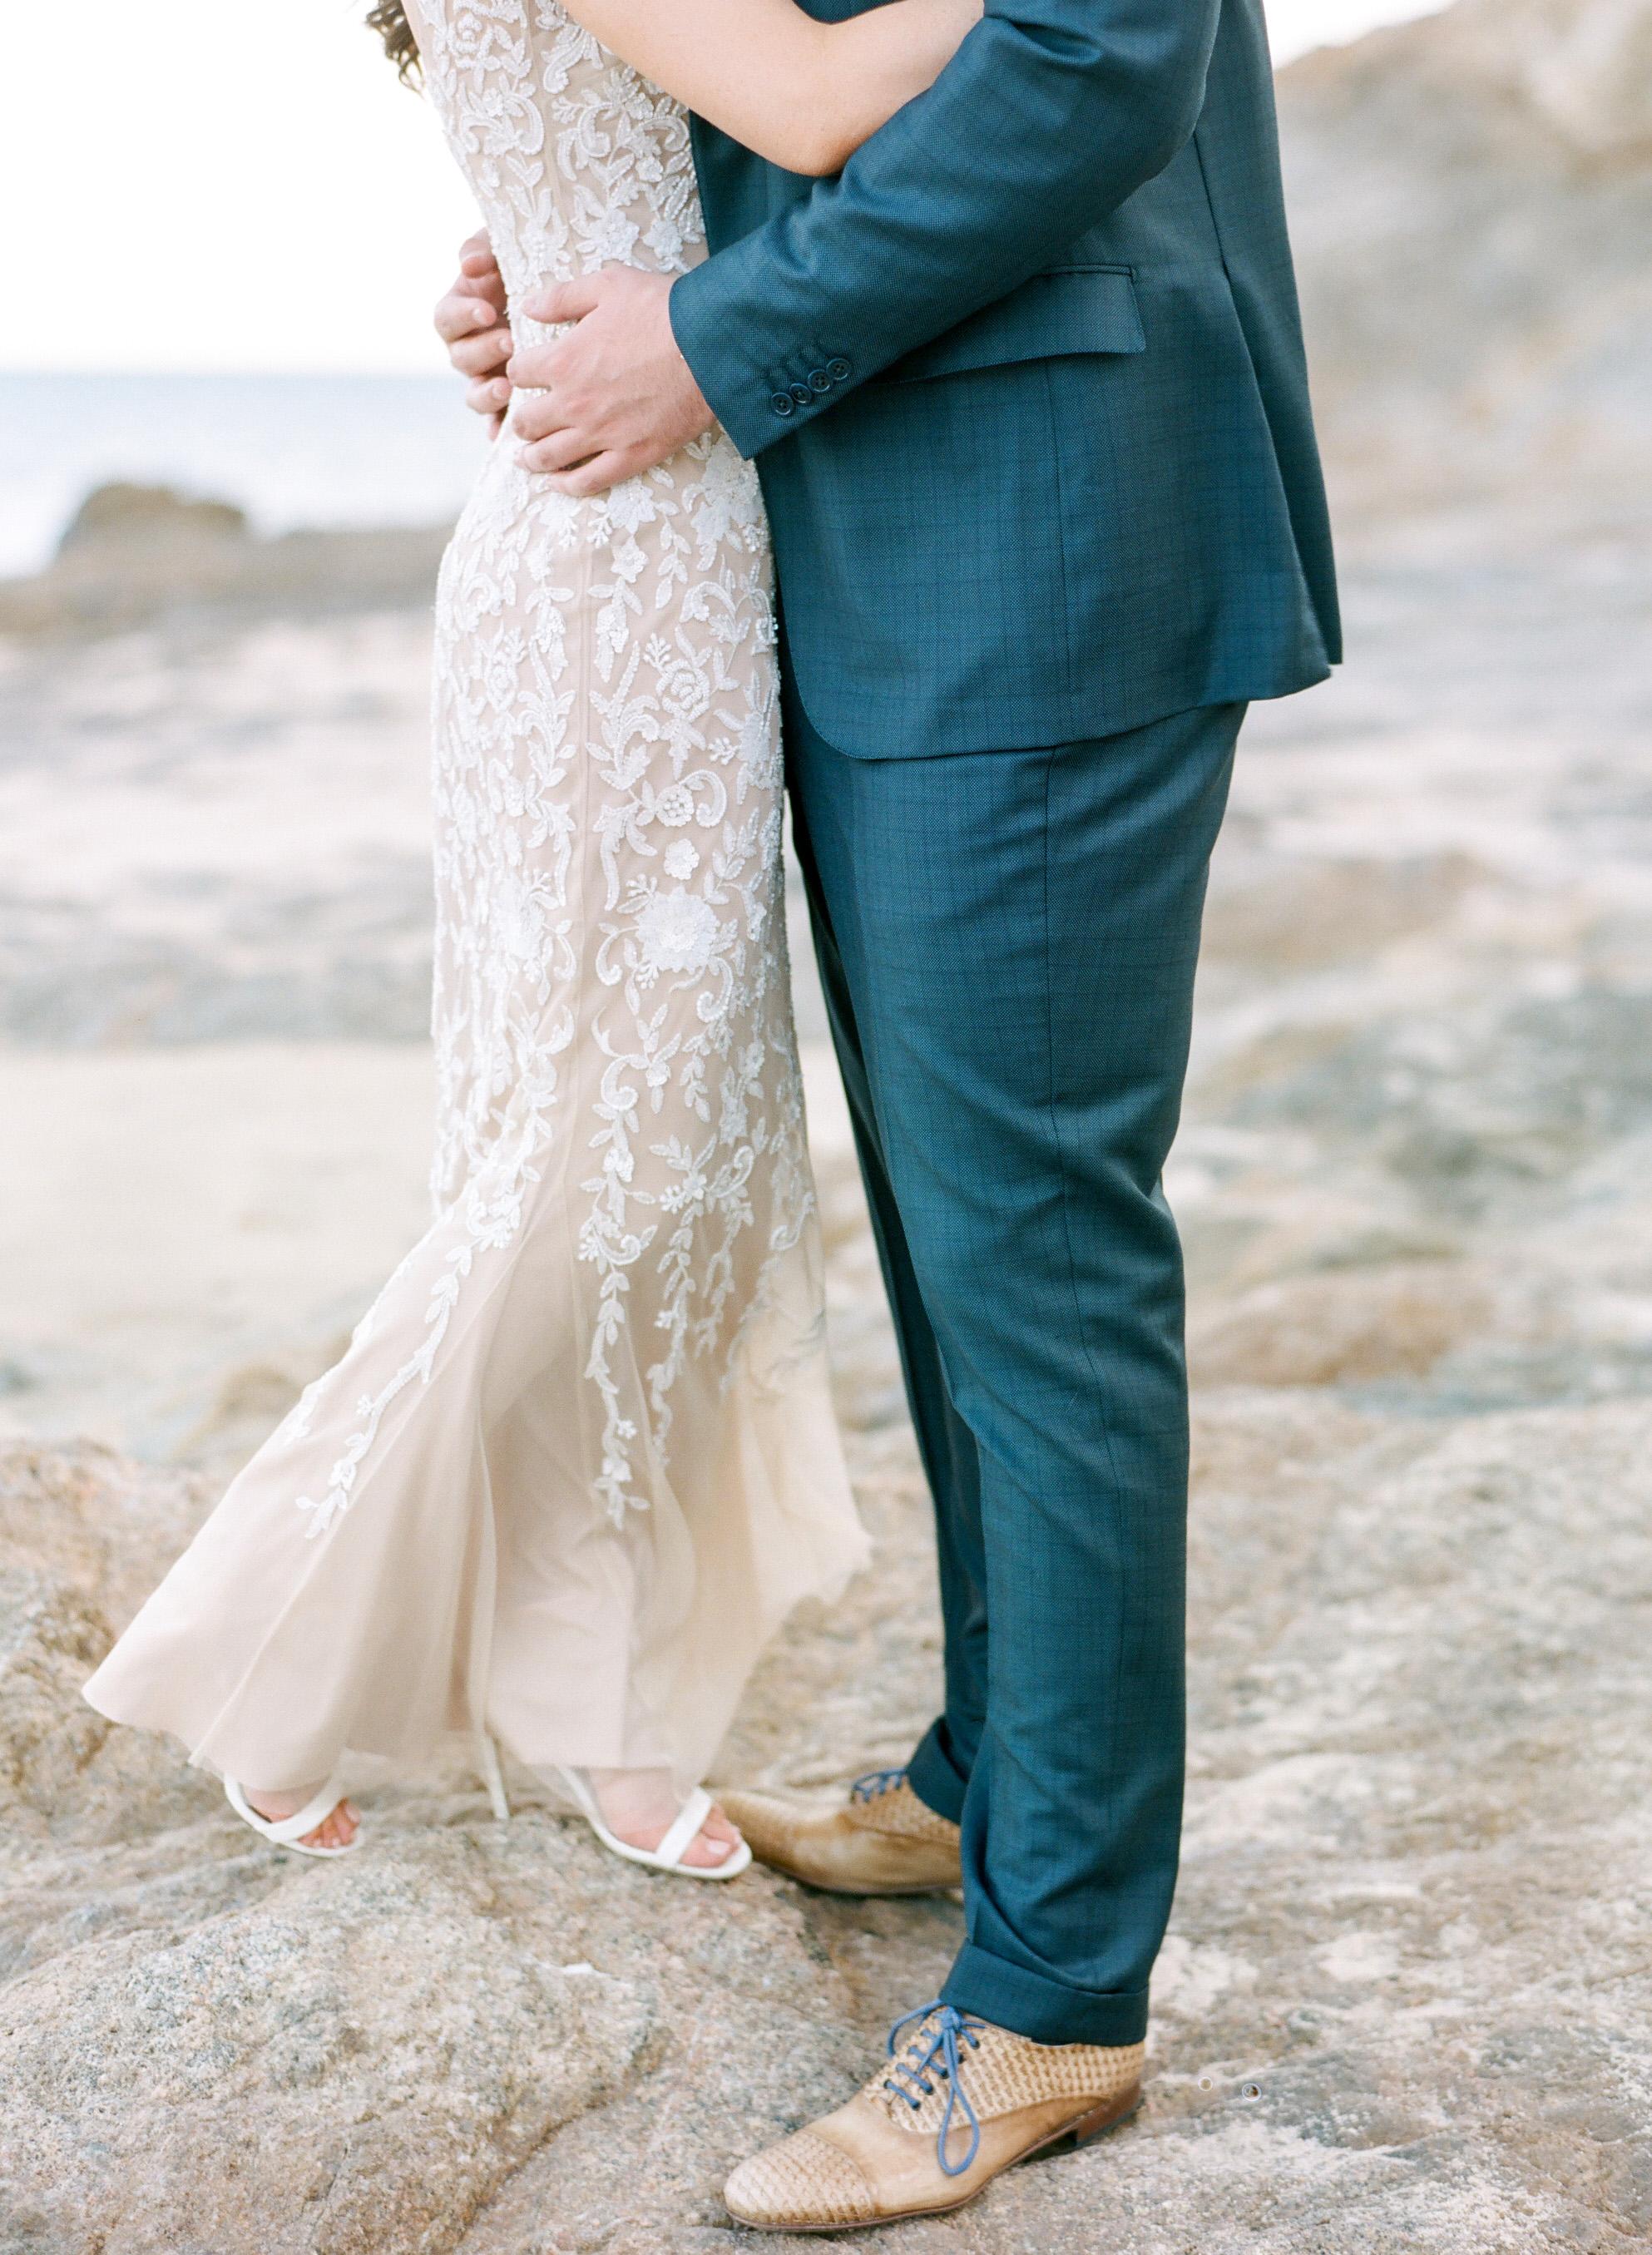 Dana-Fernandez-Photography-Destination-Wedding-Photographer-Cabo-San-Lucas-Film-Houston-Texas-Cabo-11.jpg